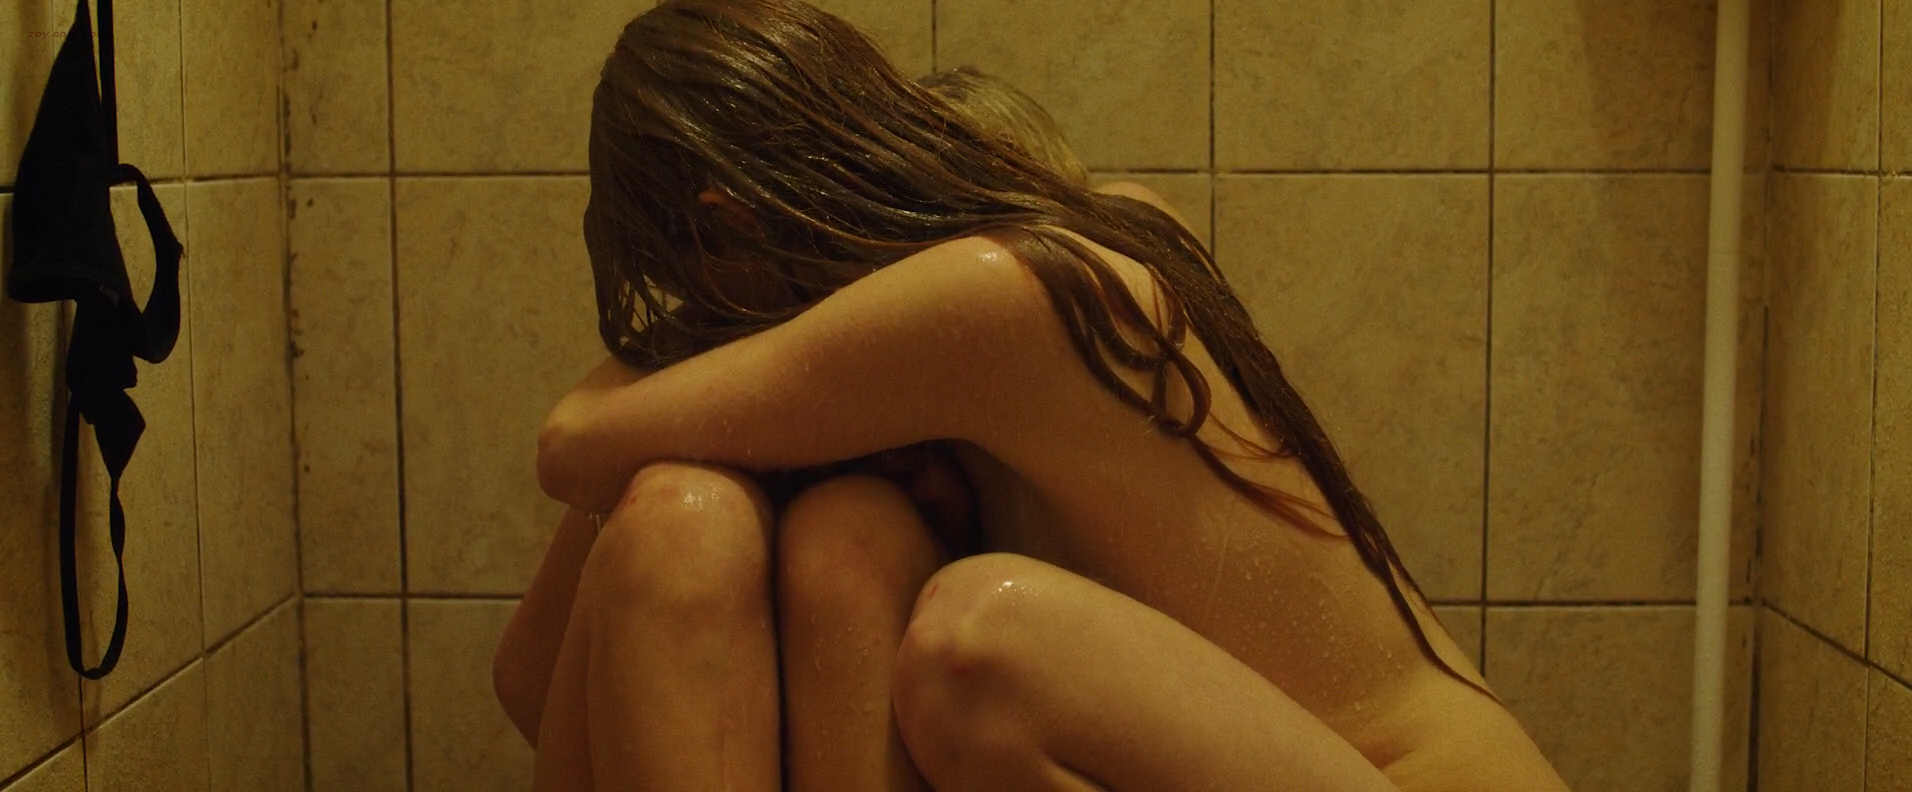 Morgan Saylor nude topless explicit blow job and India Menuez nude - White Girl (2016) HD 1080p (16)